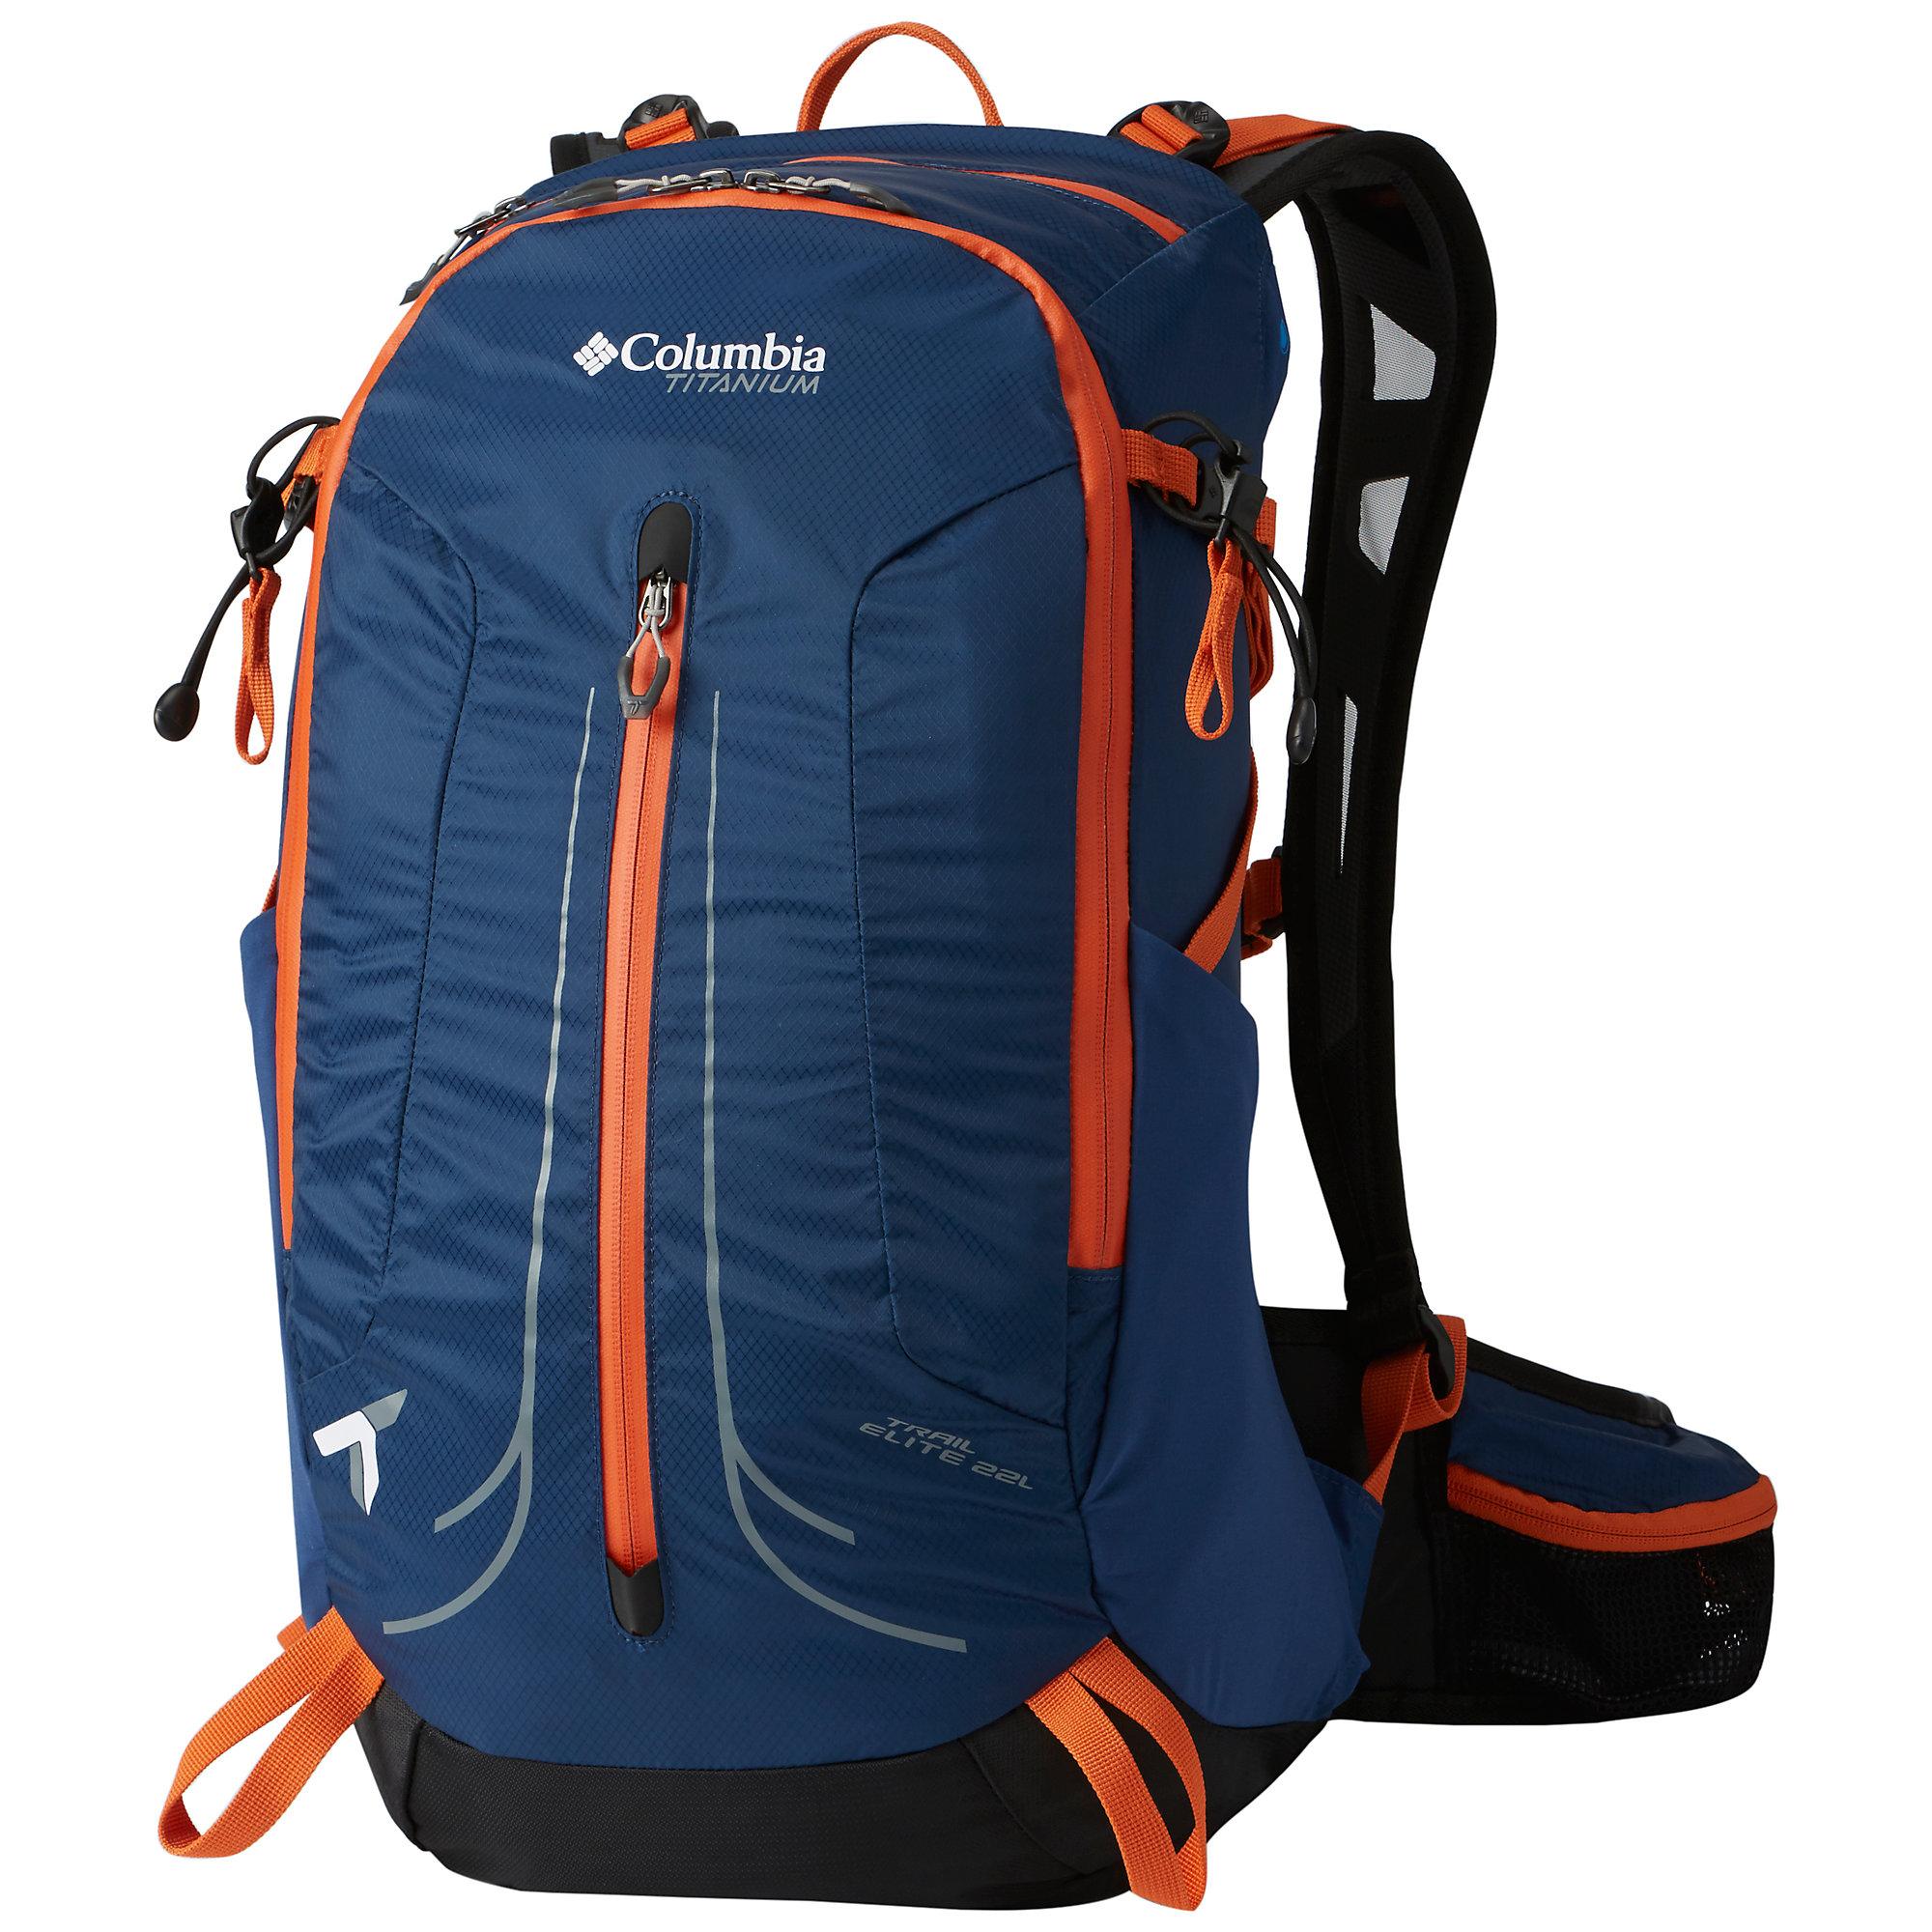 Columbia Trail Elite 22L